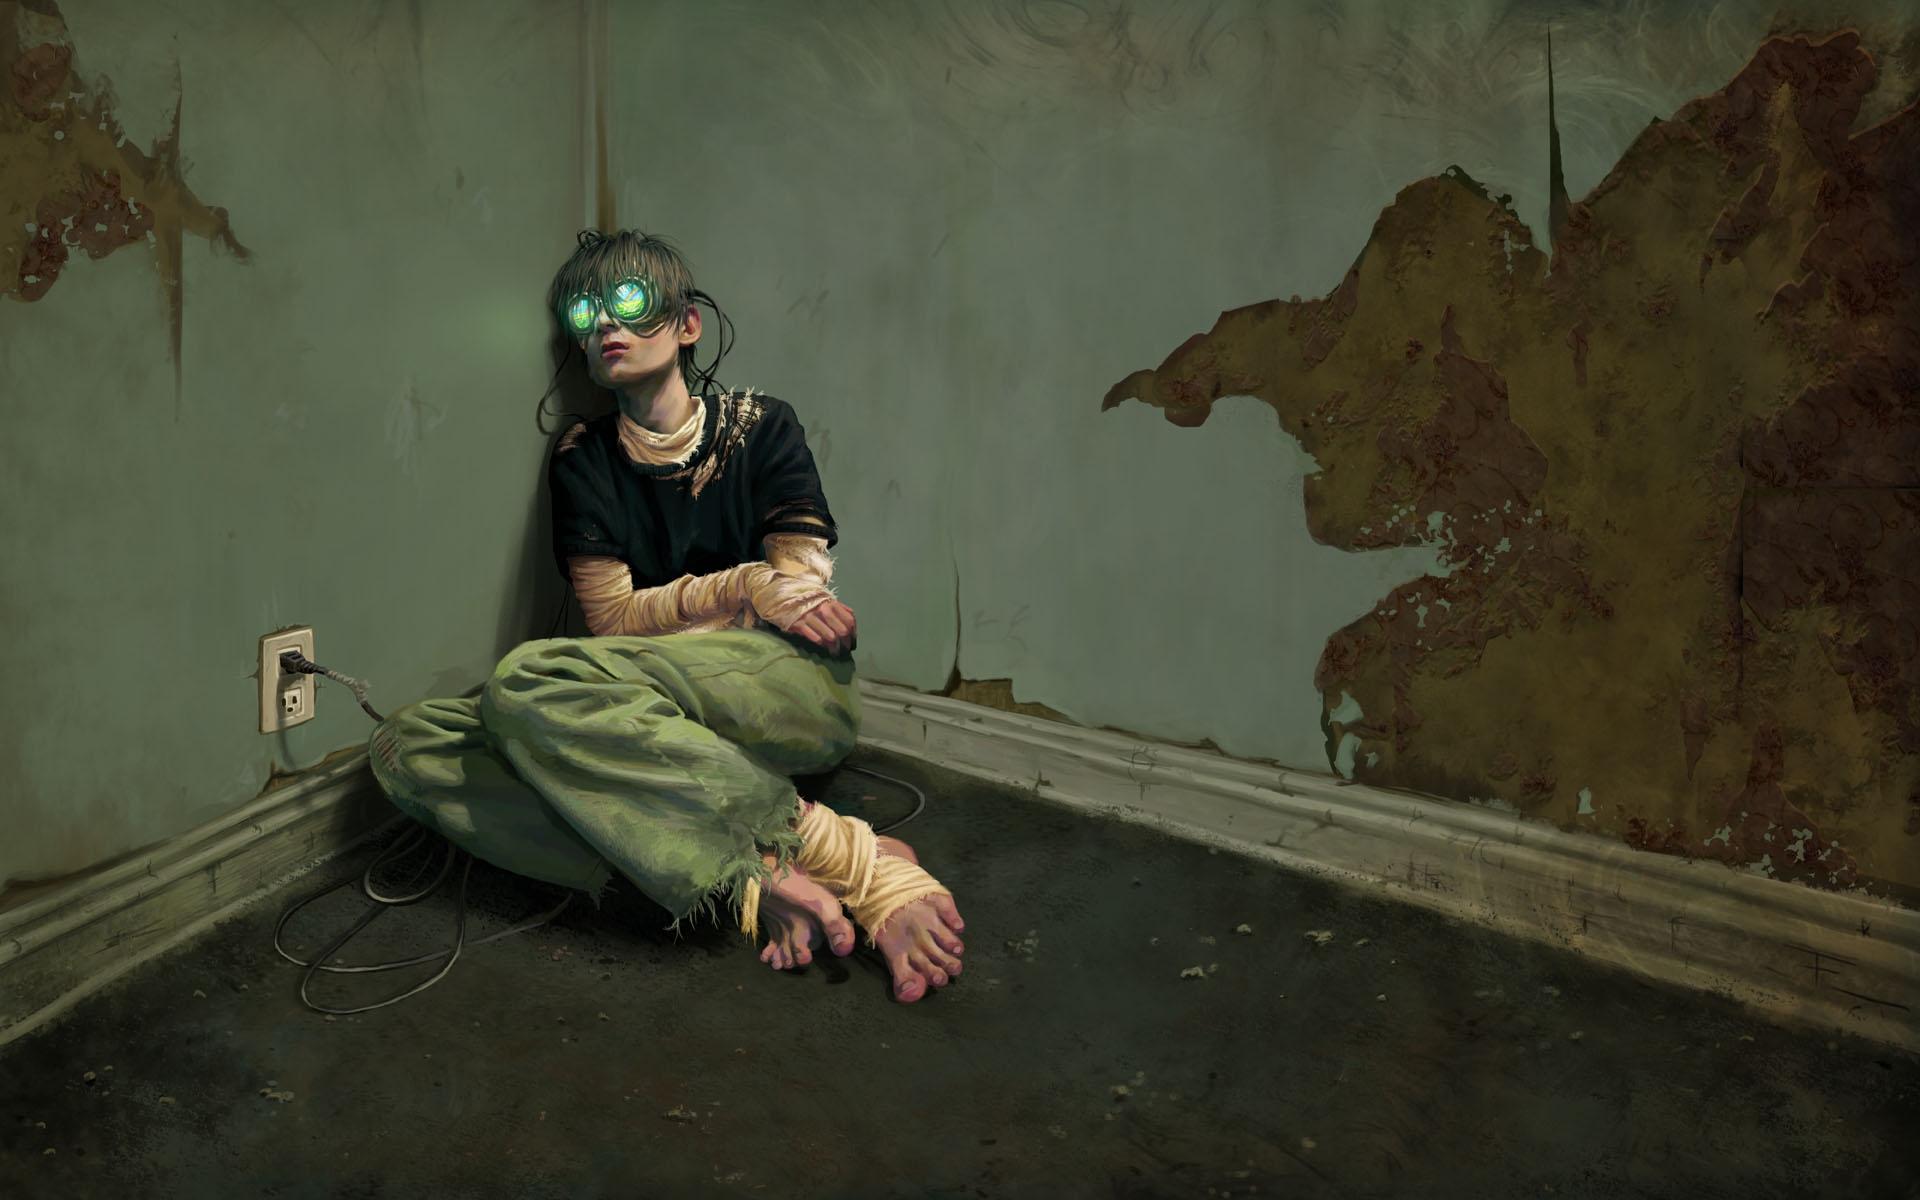 dark-science-fiction-immersive-virtual-reality-junkie-image-source-unknown.jpg